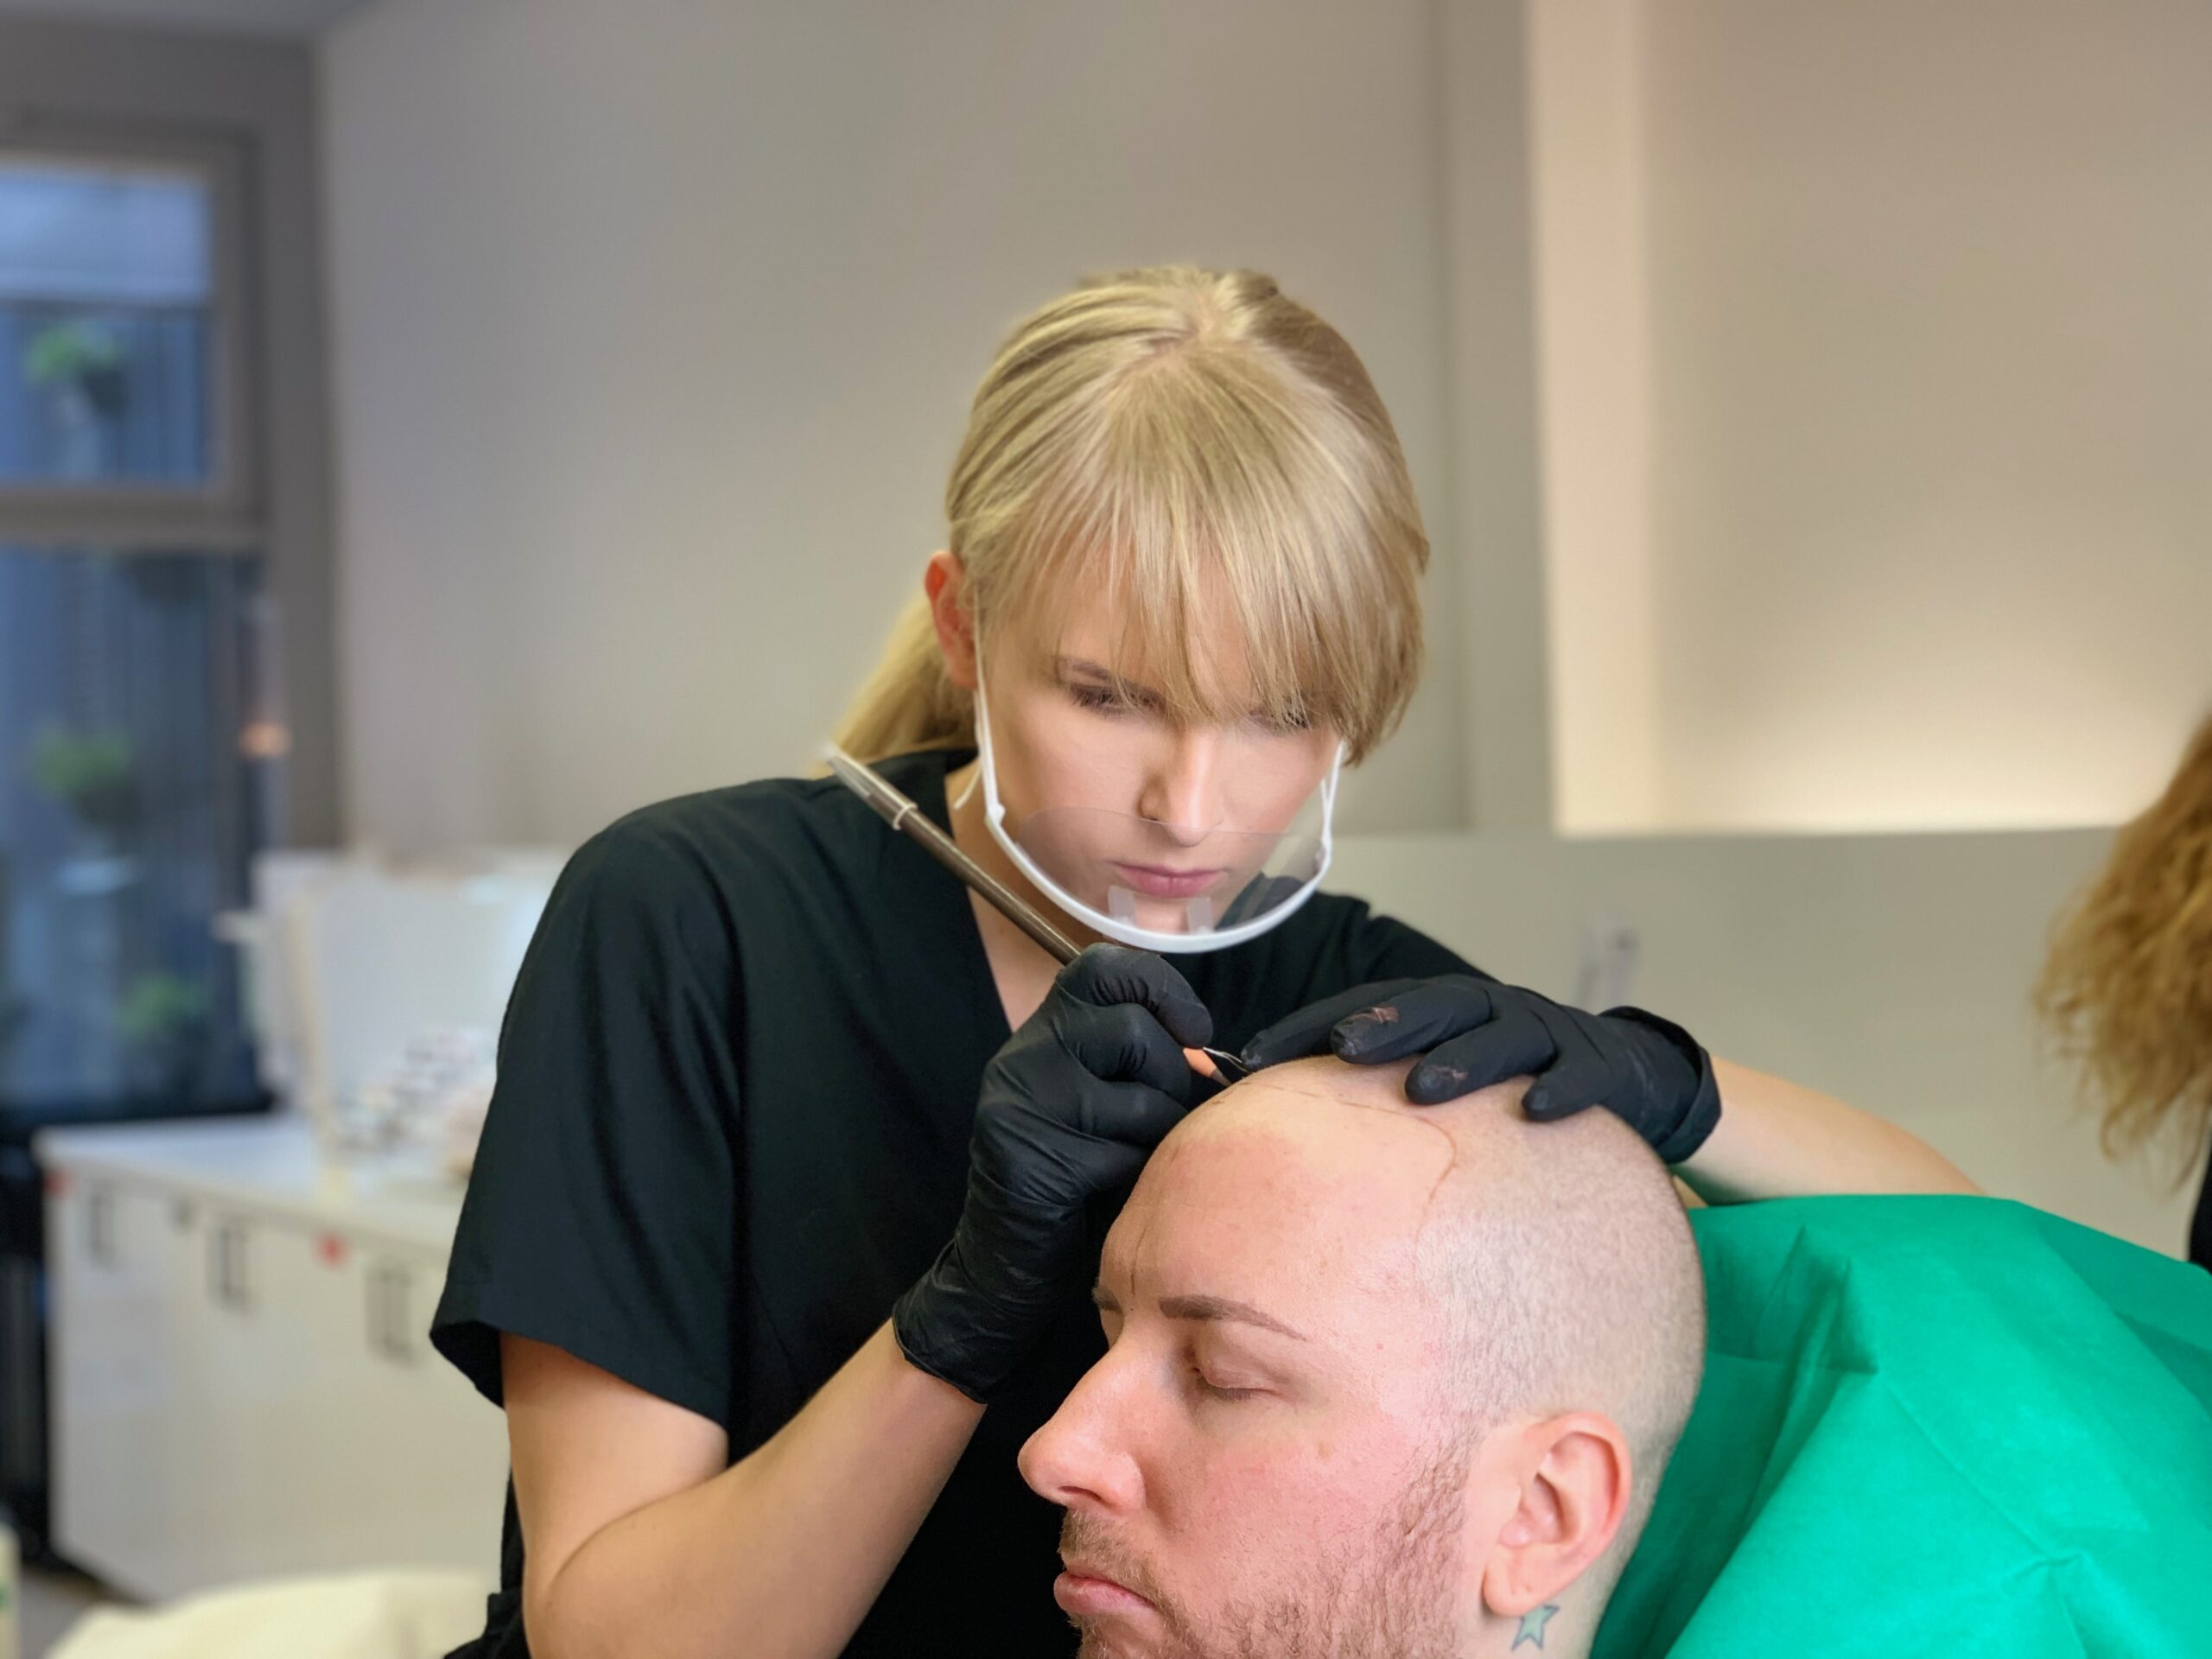 Skalpo permanentinio makiažo procedūra